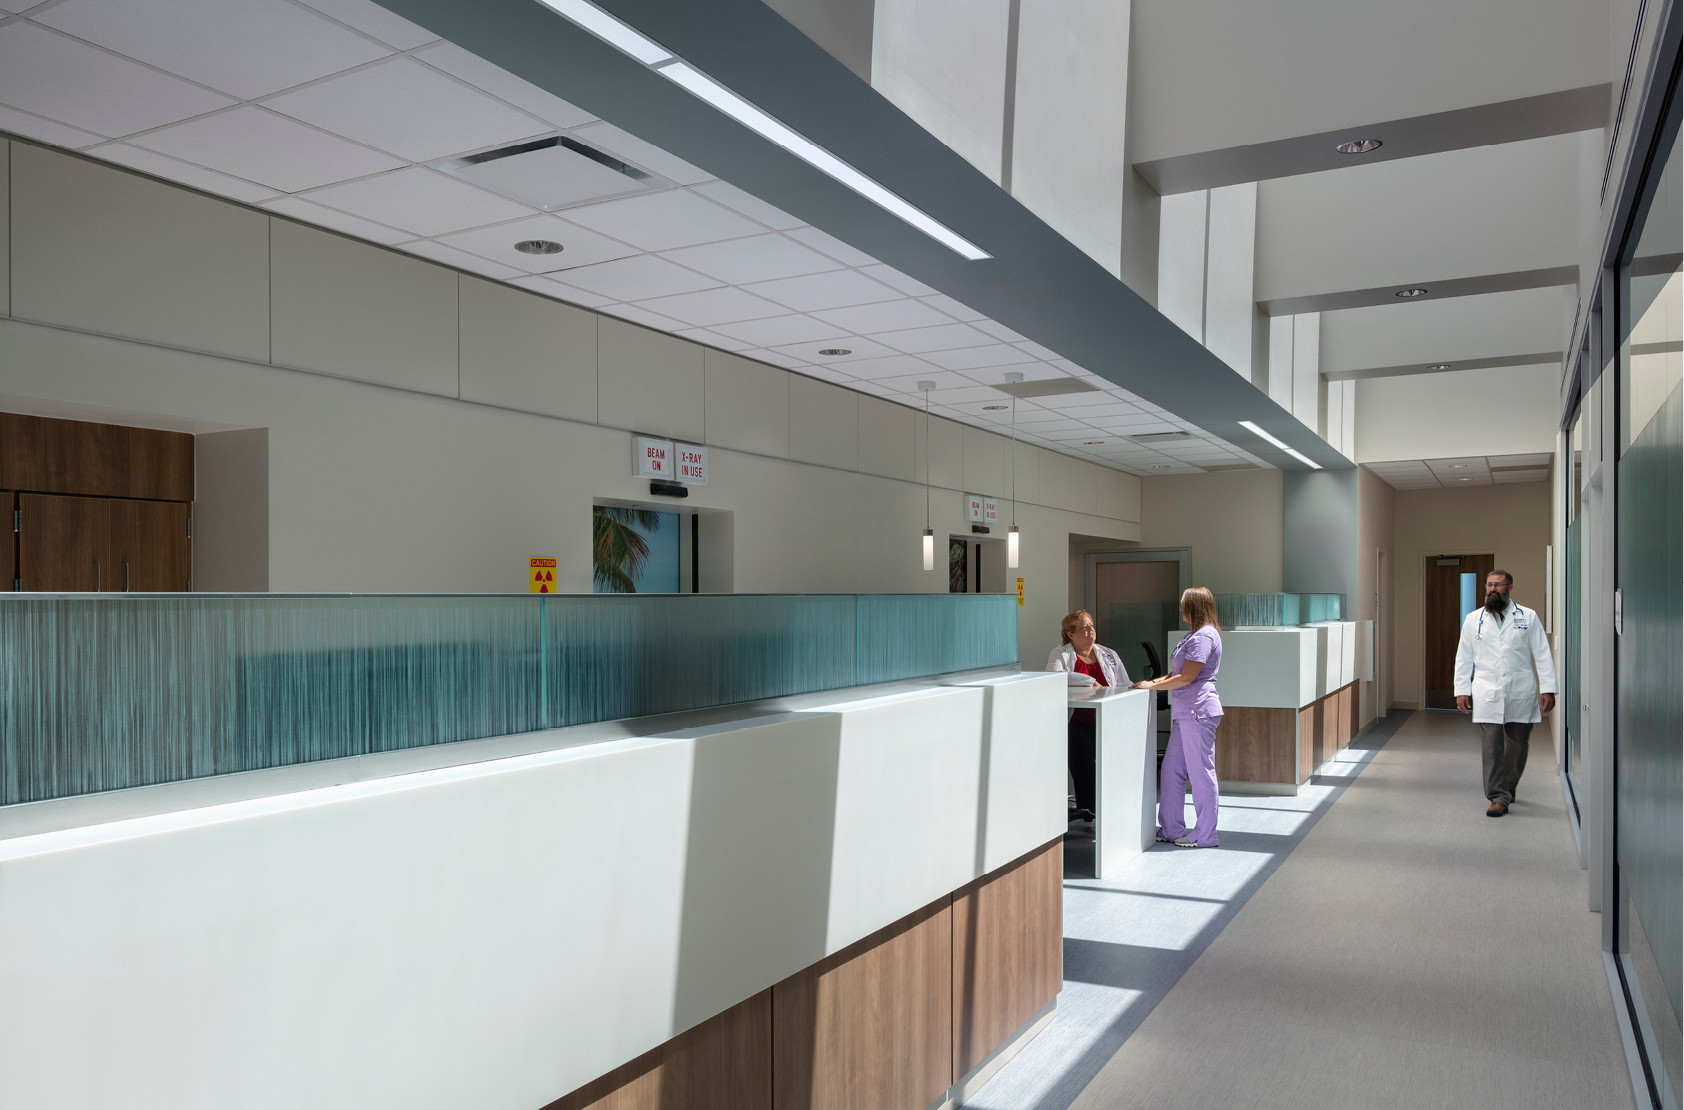 Sarasota Memorial Hospital - Radiation Oncology Center